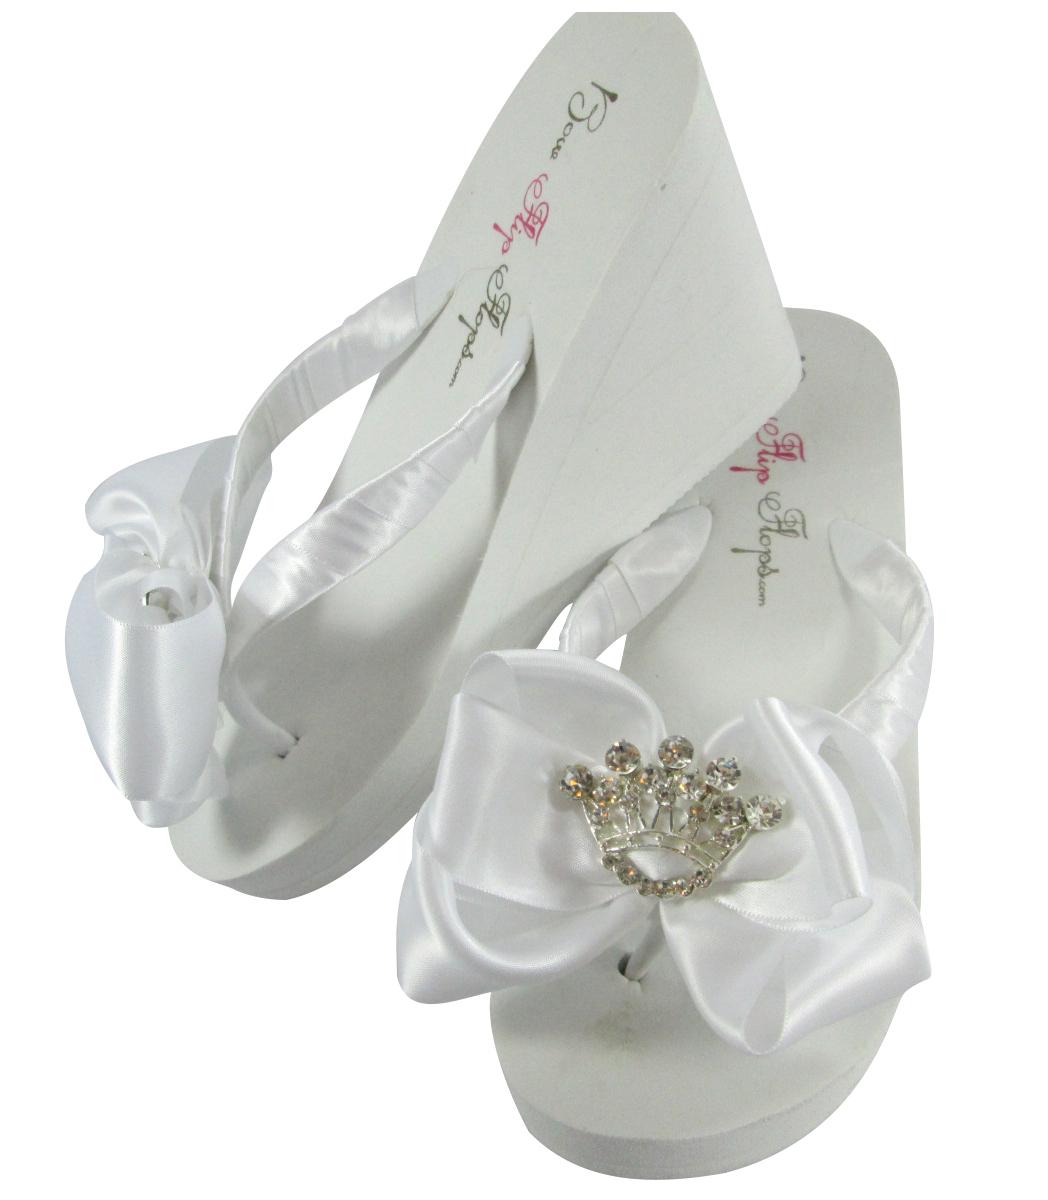 826c771d0 Teal Satin Tropic Bow Flip Flops- Wedge- and 50 similar items